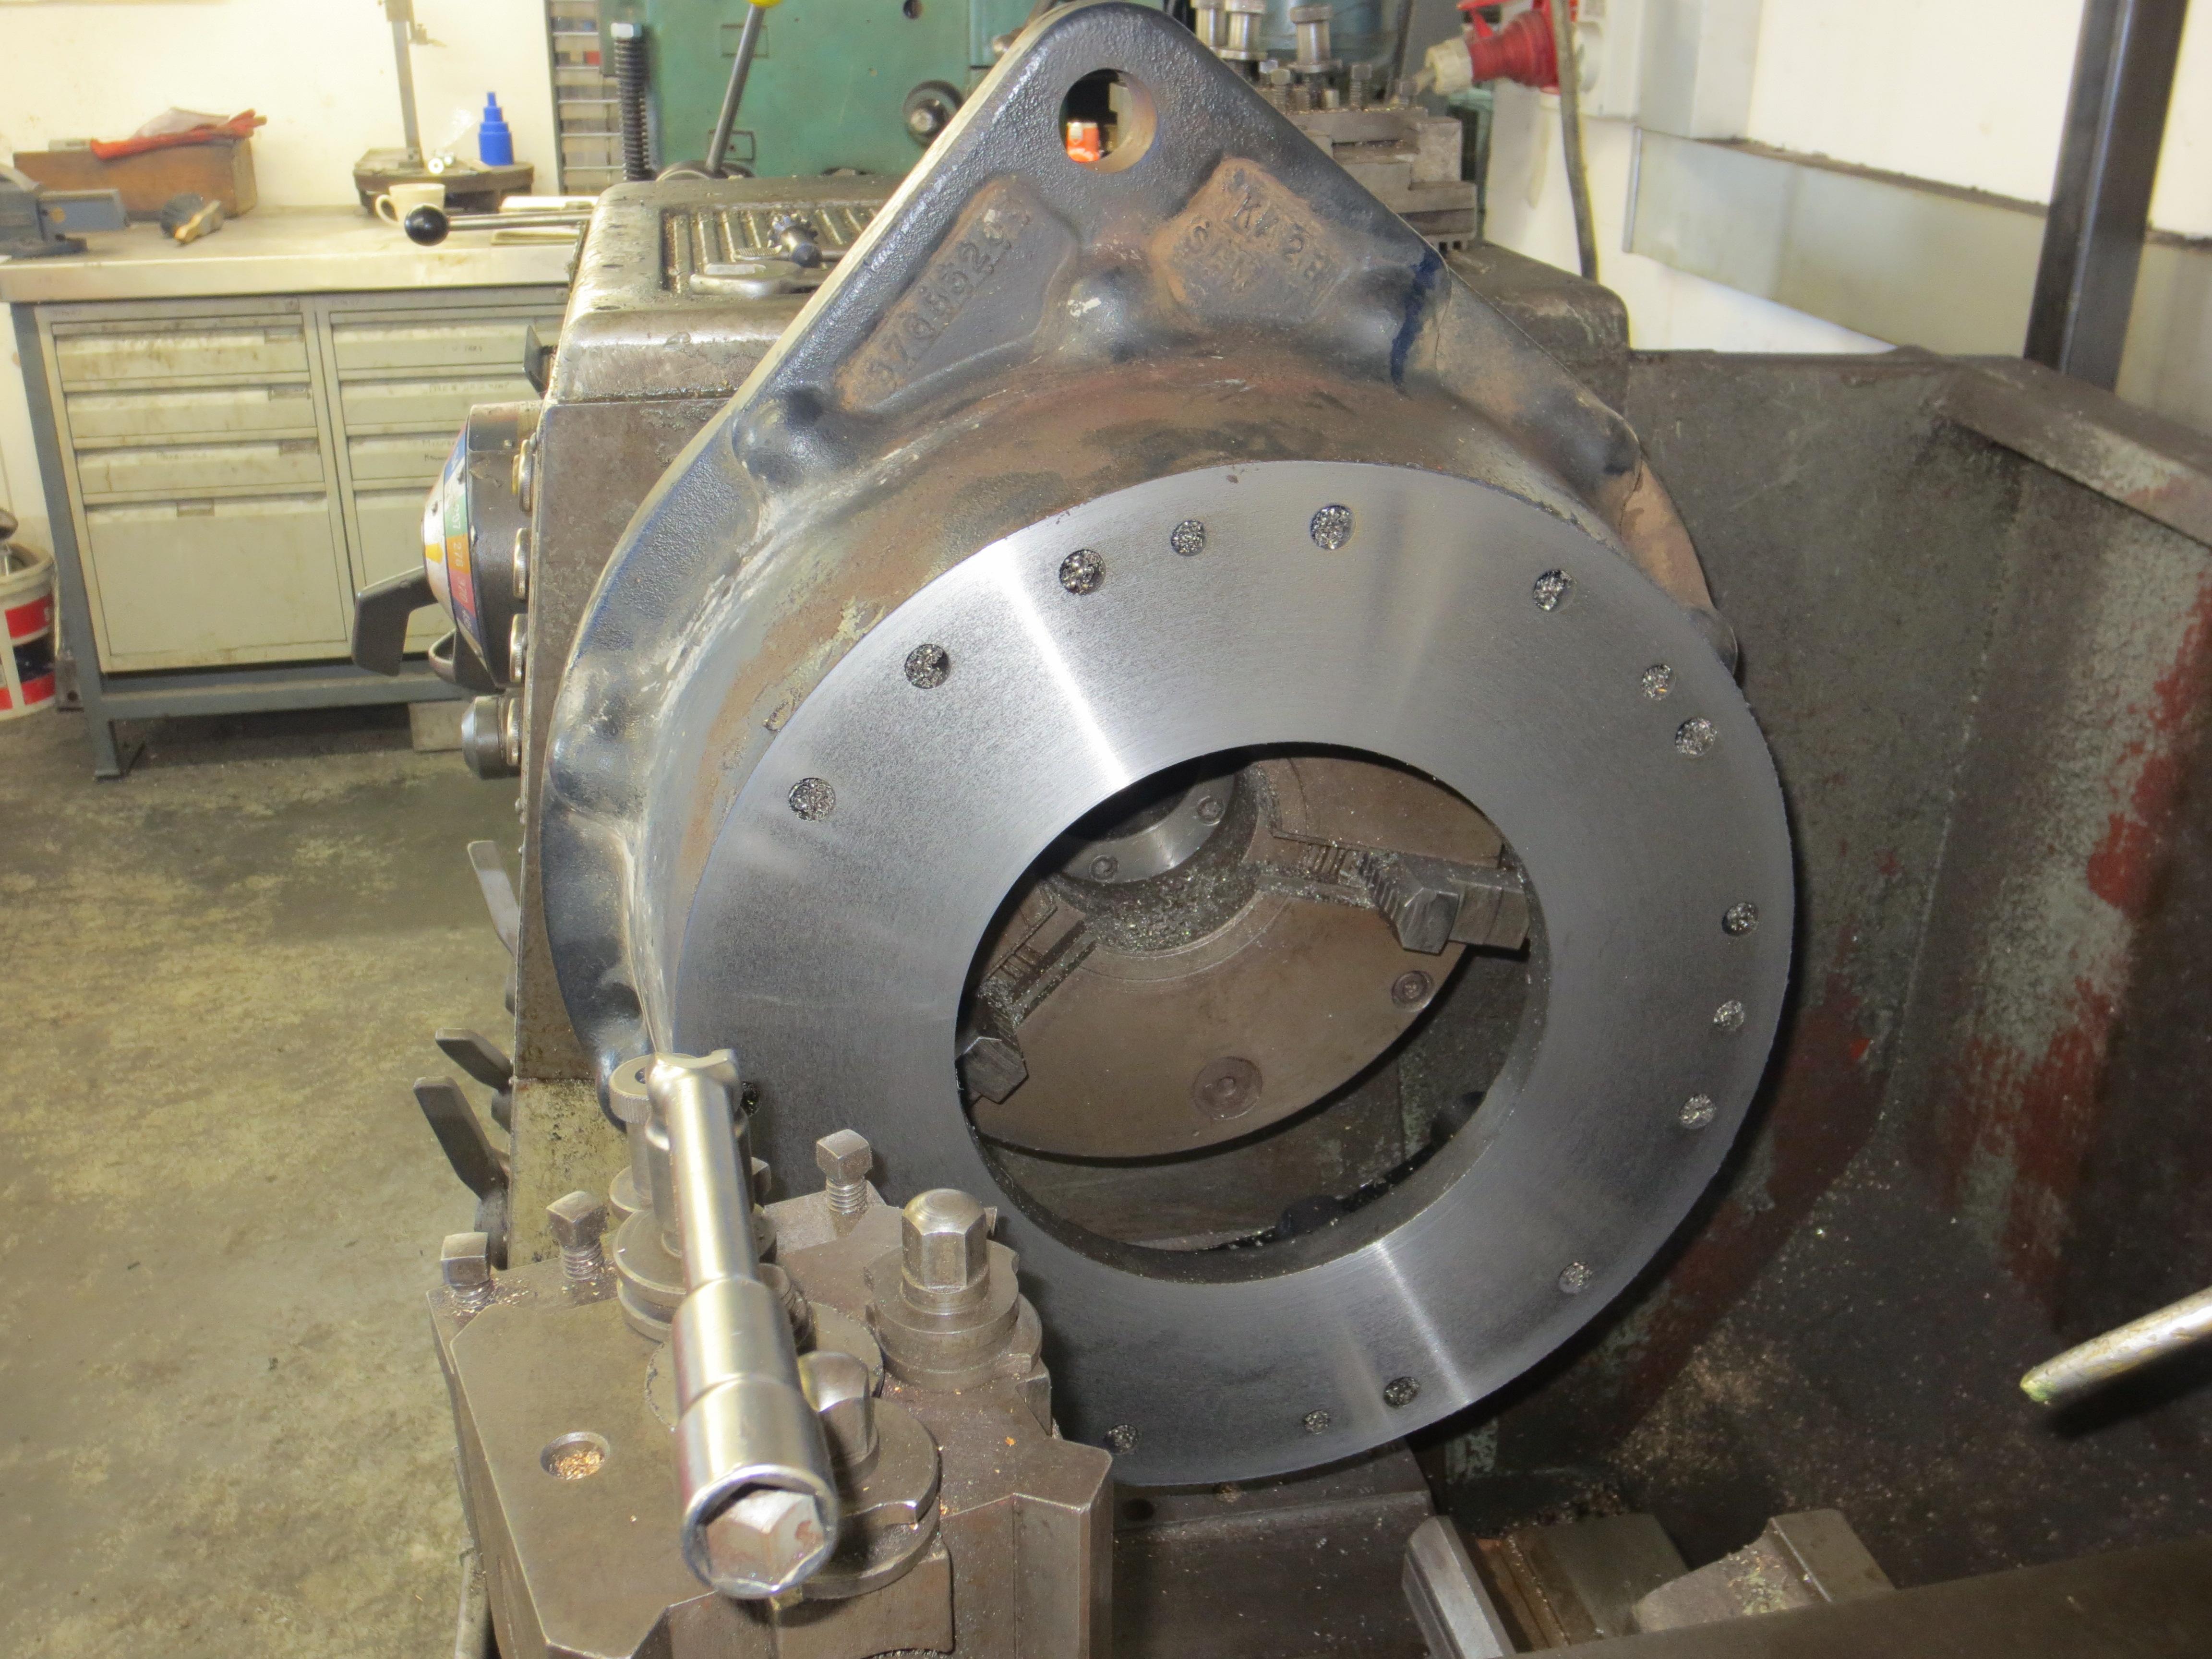 on lathe hub being machined